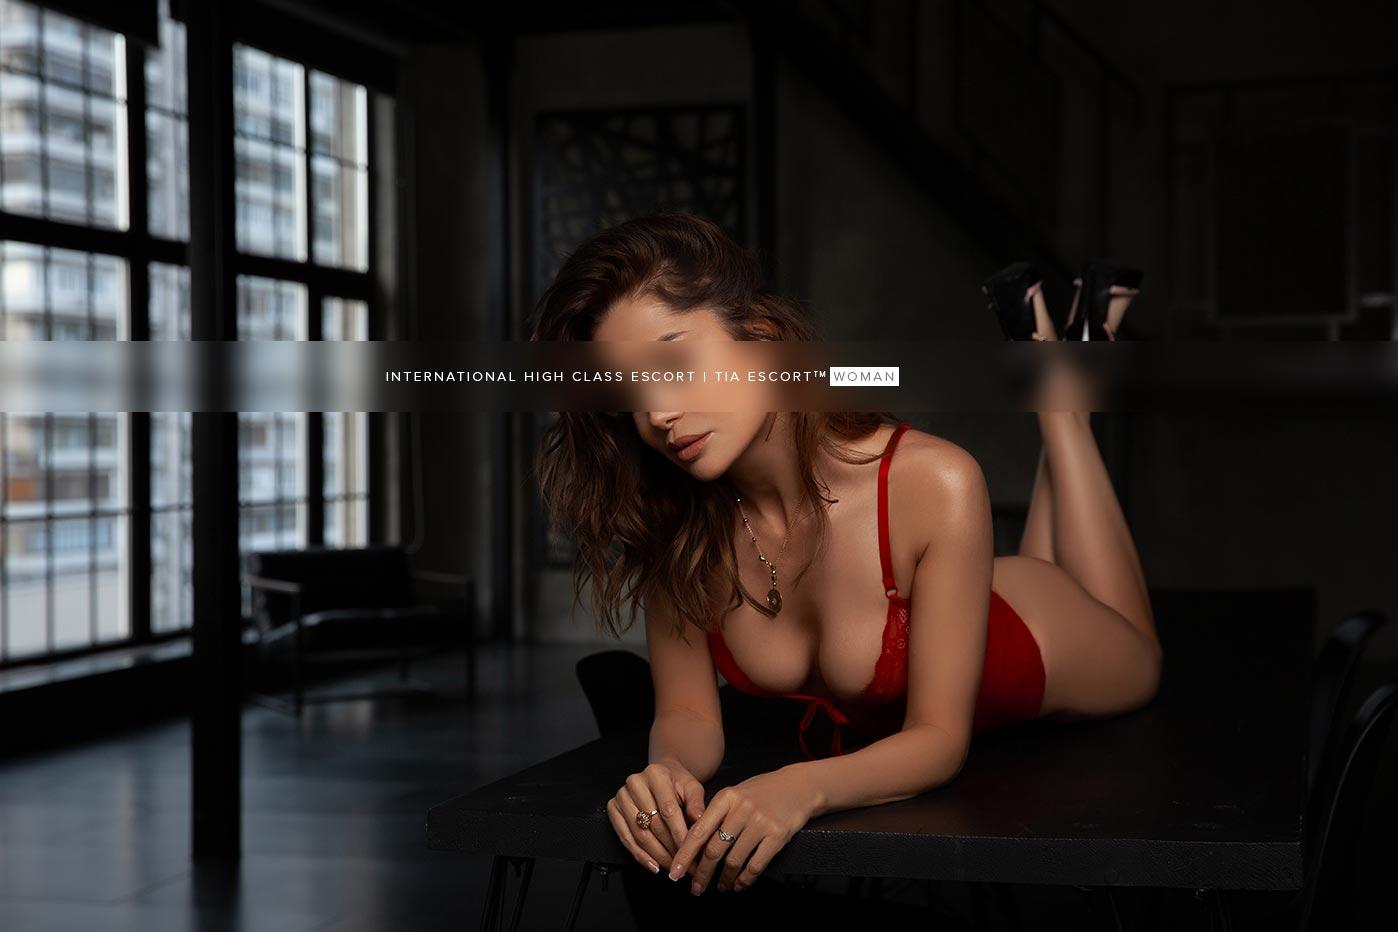 Girlfriend Erotik Berlin - Coco 6